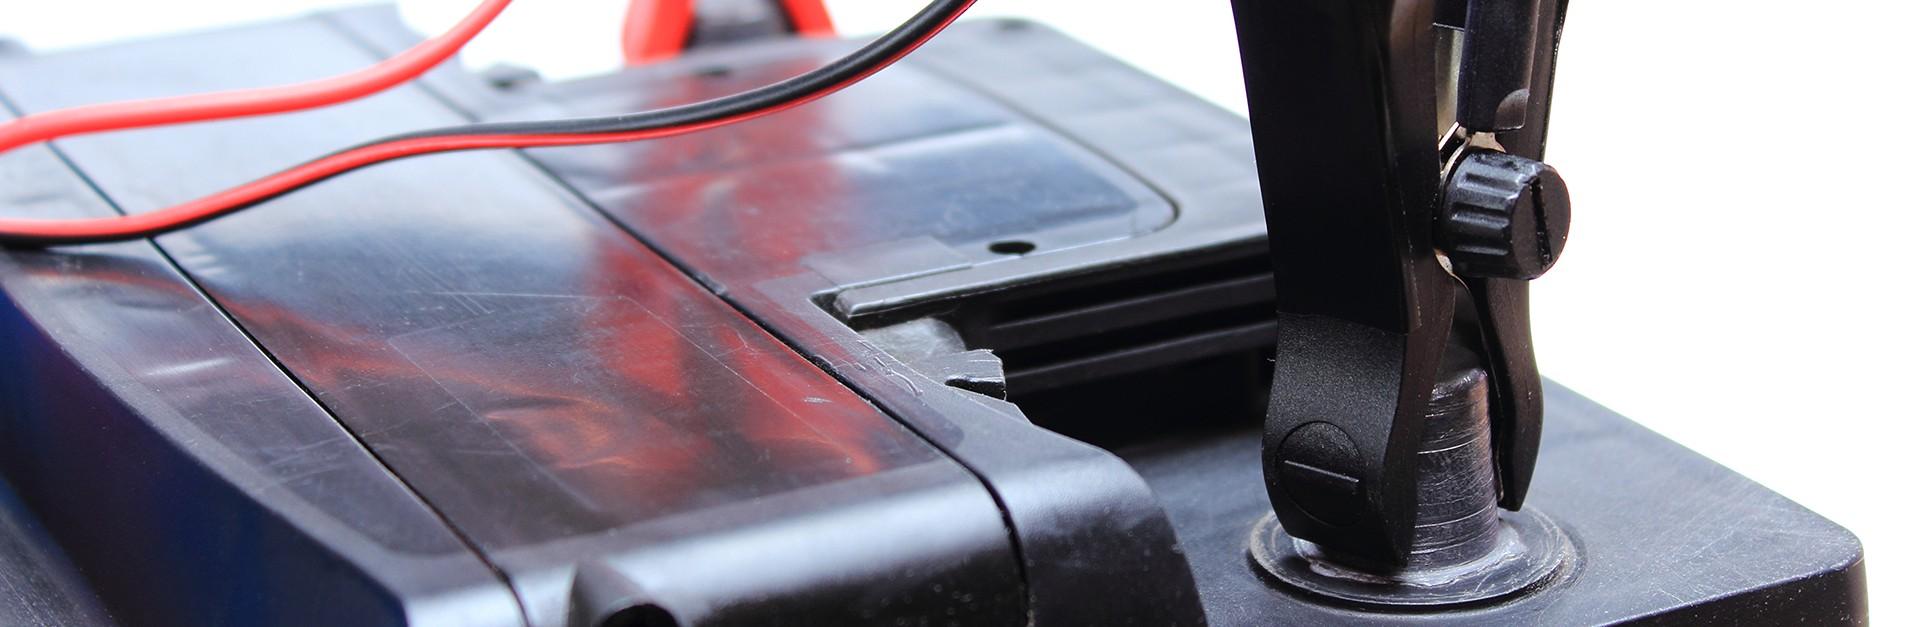 RV Battery Charging 101  All Seasons RV Blog